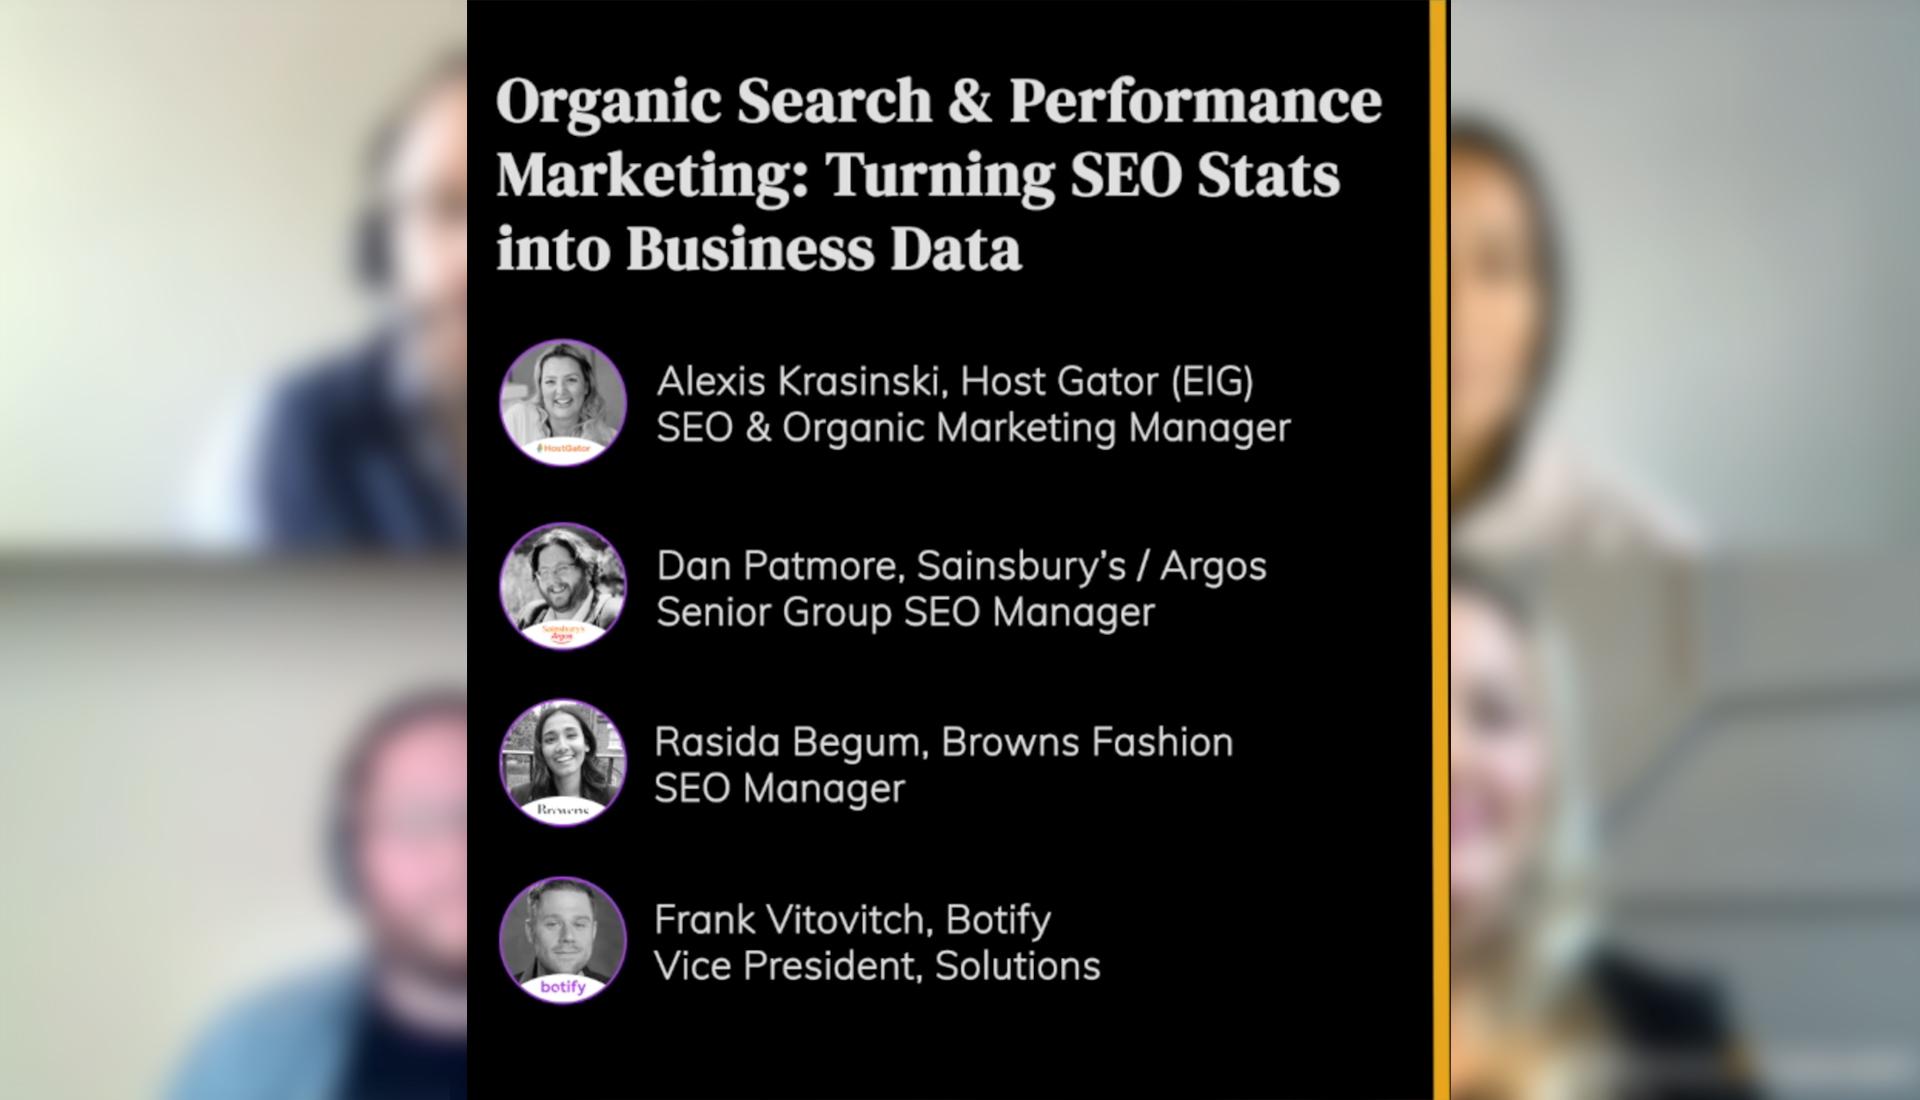 Organic Search & Performance Marketing: Turning SEO Stats into Business Data